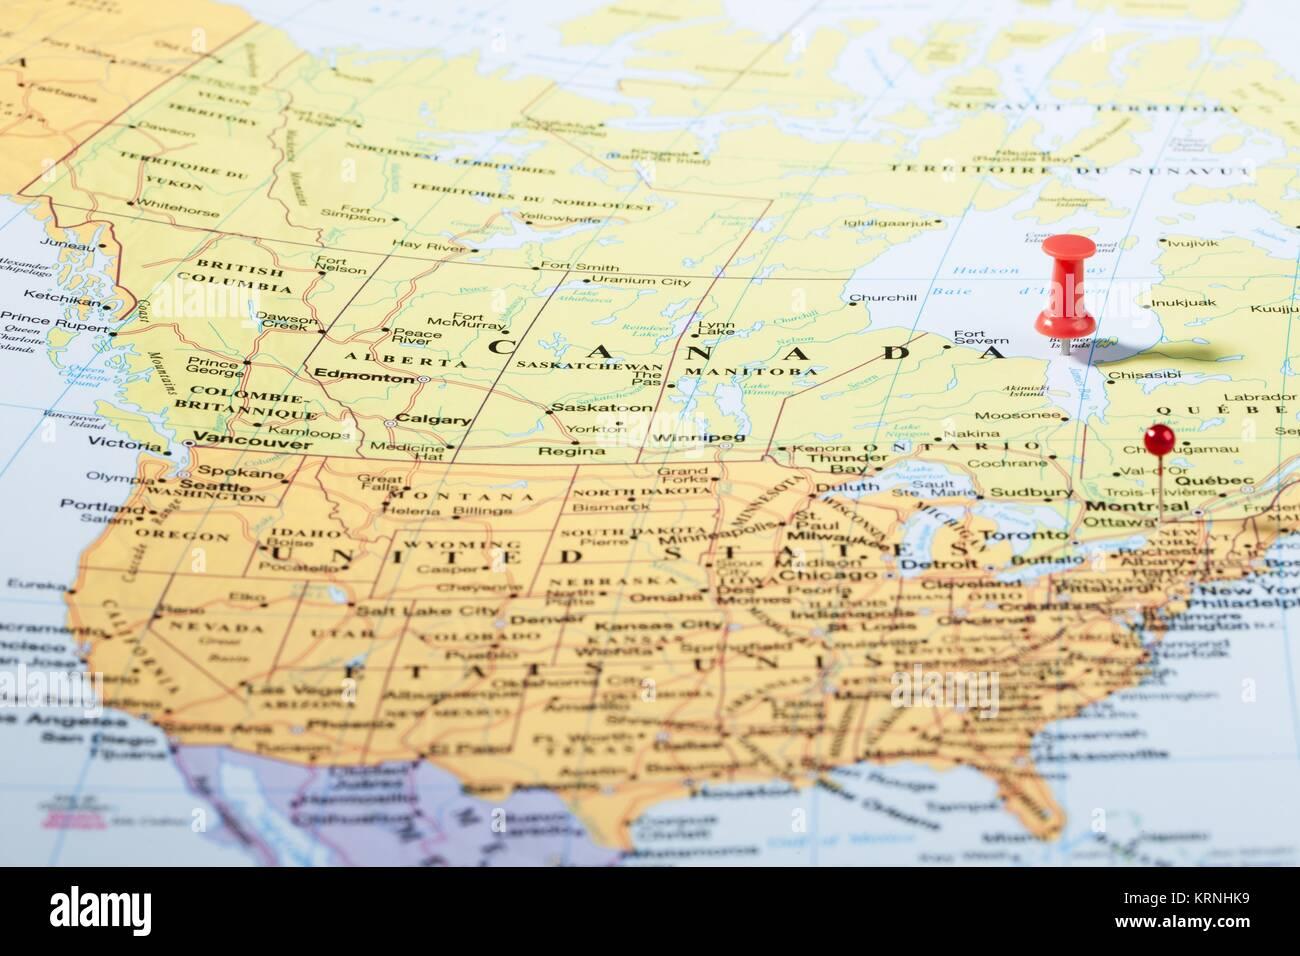 Canada travel map push pins stock photos canada travel map push pushpins on map of north america stock image gumiabroncs Choice Image